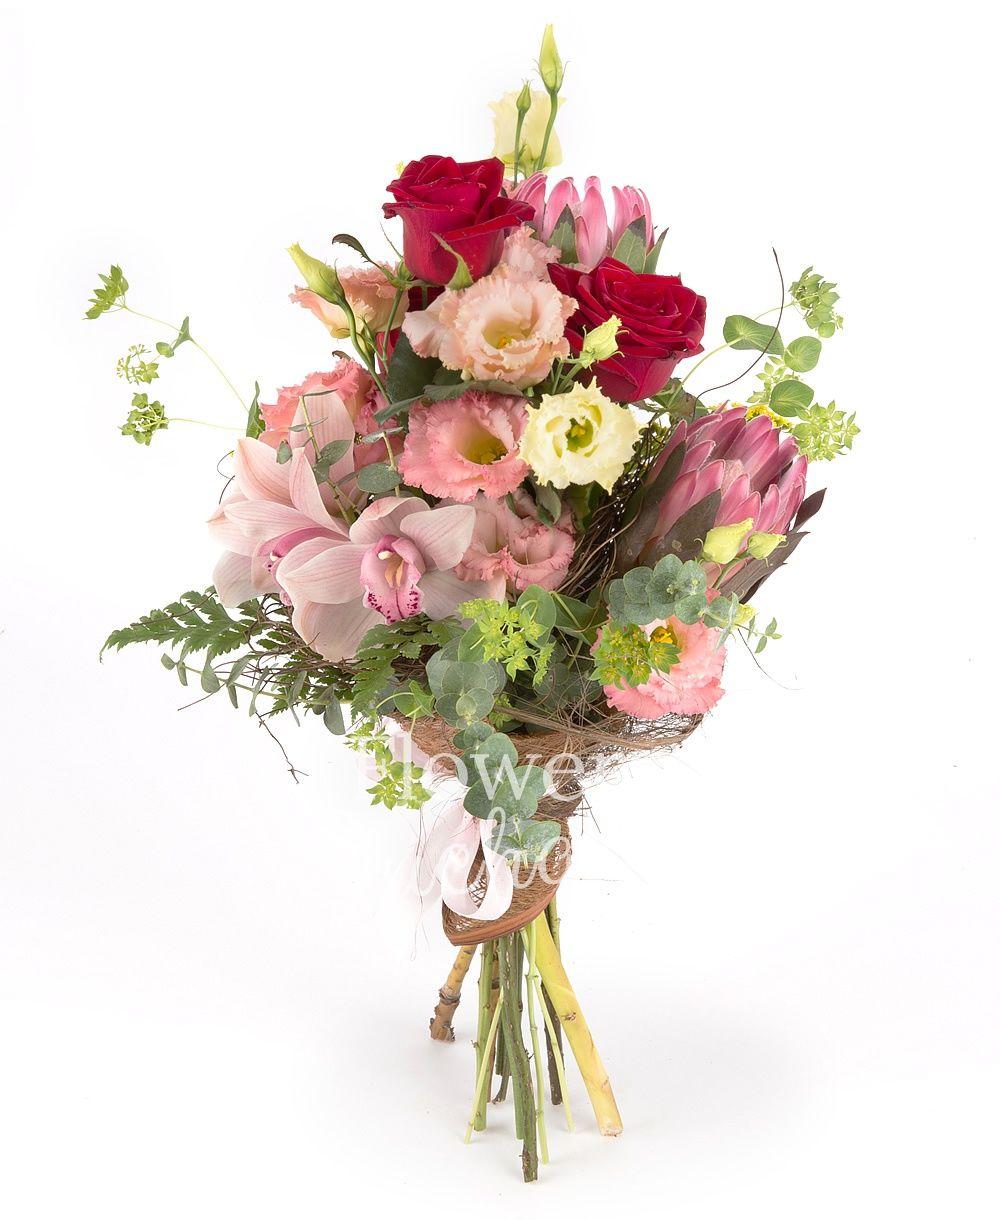 2 proteea, 3 red roses, 5 pink lisianthus, pink cymbidium, 3 solidago, bupleurum, greenery